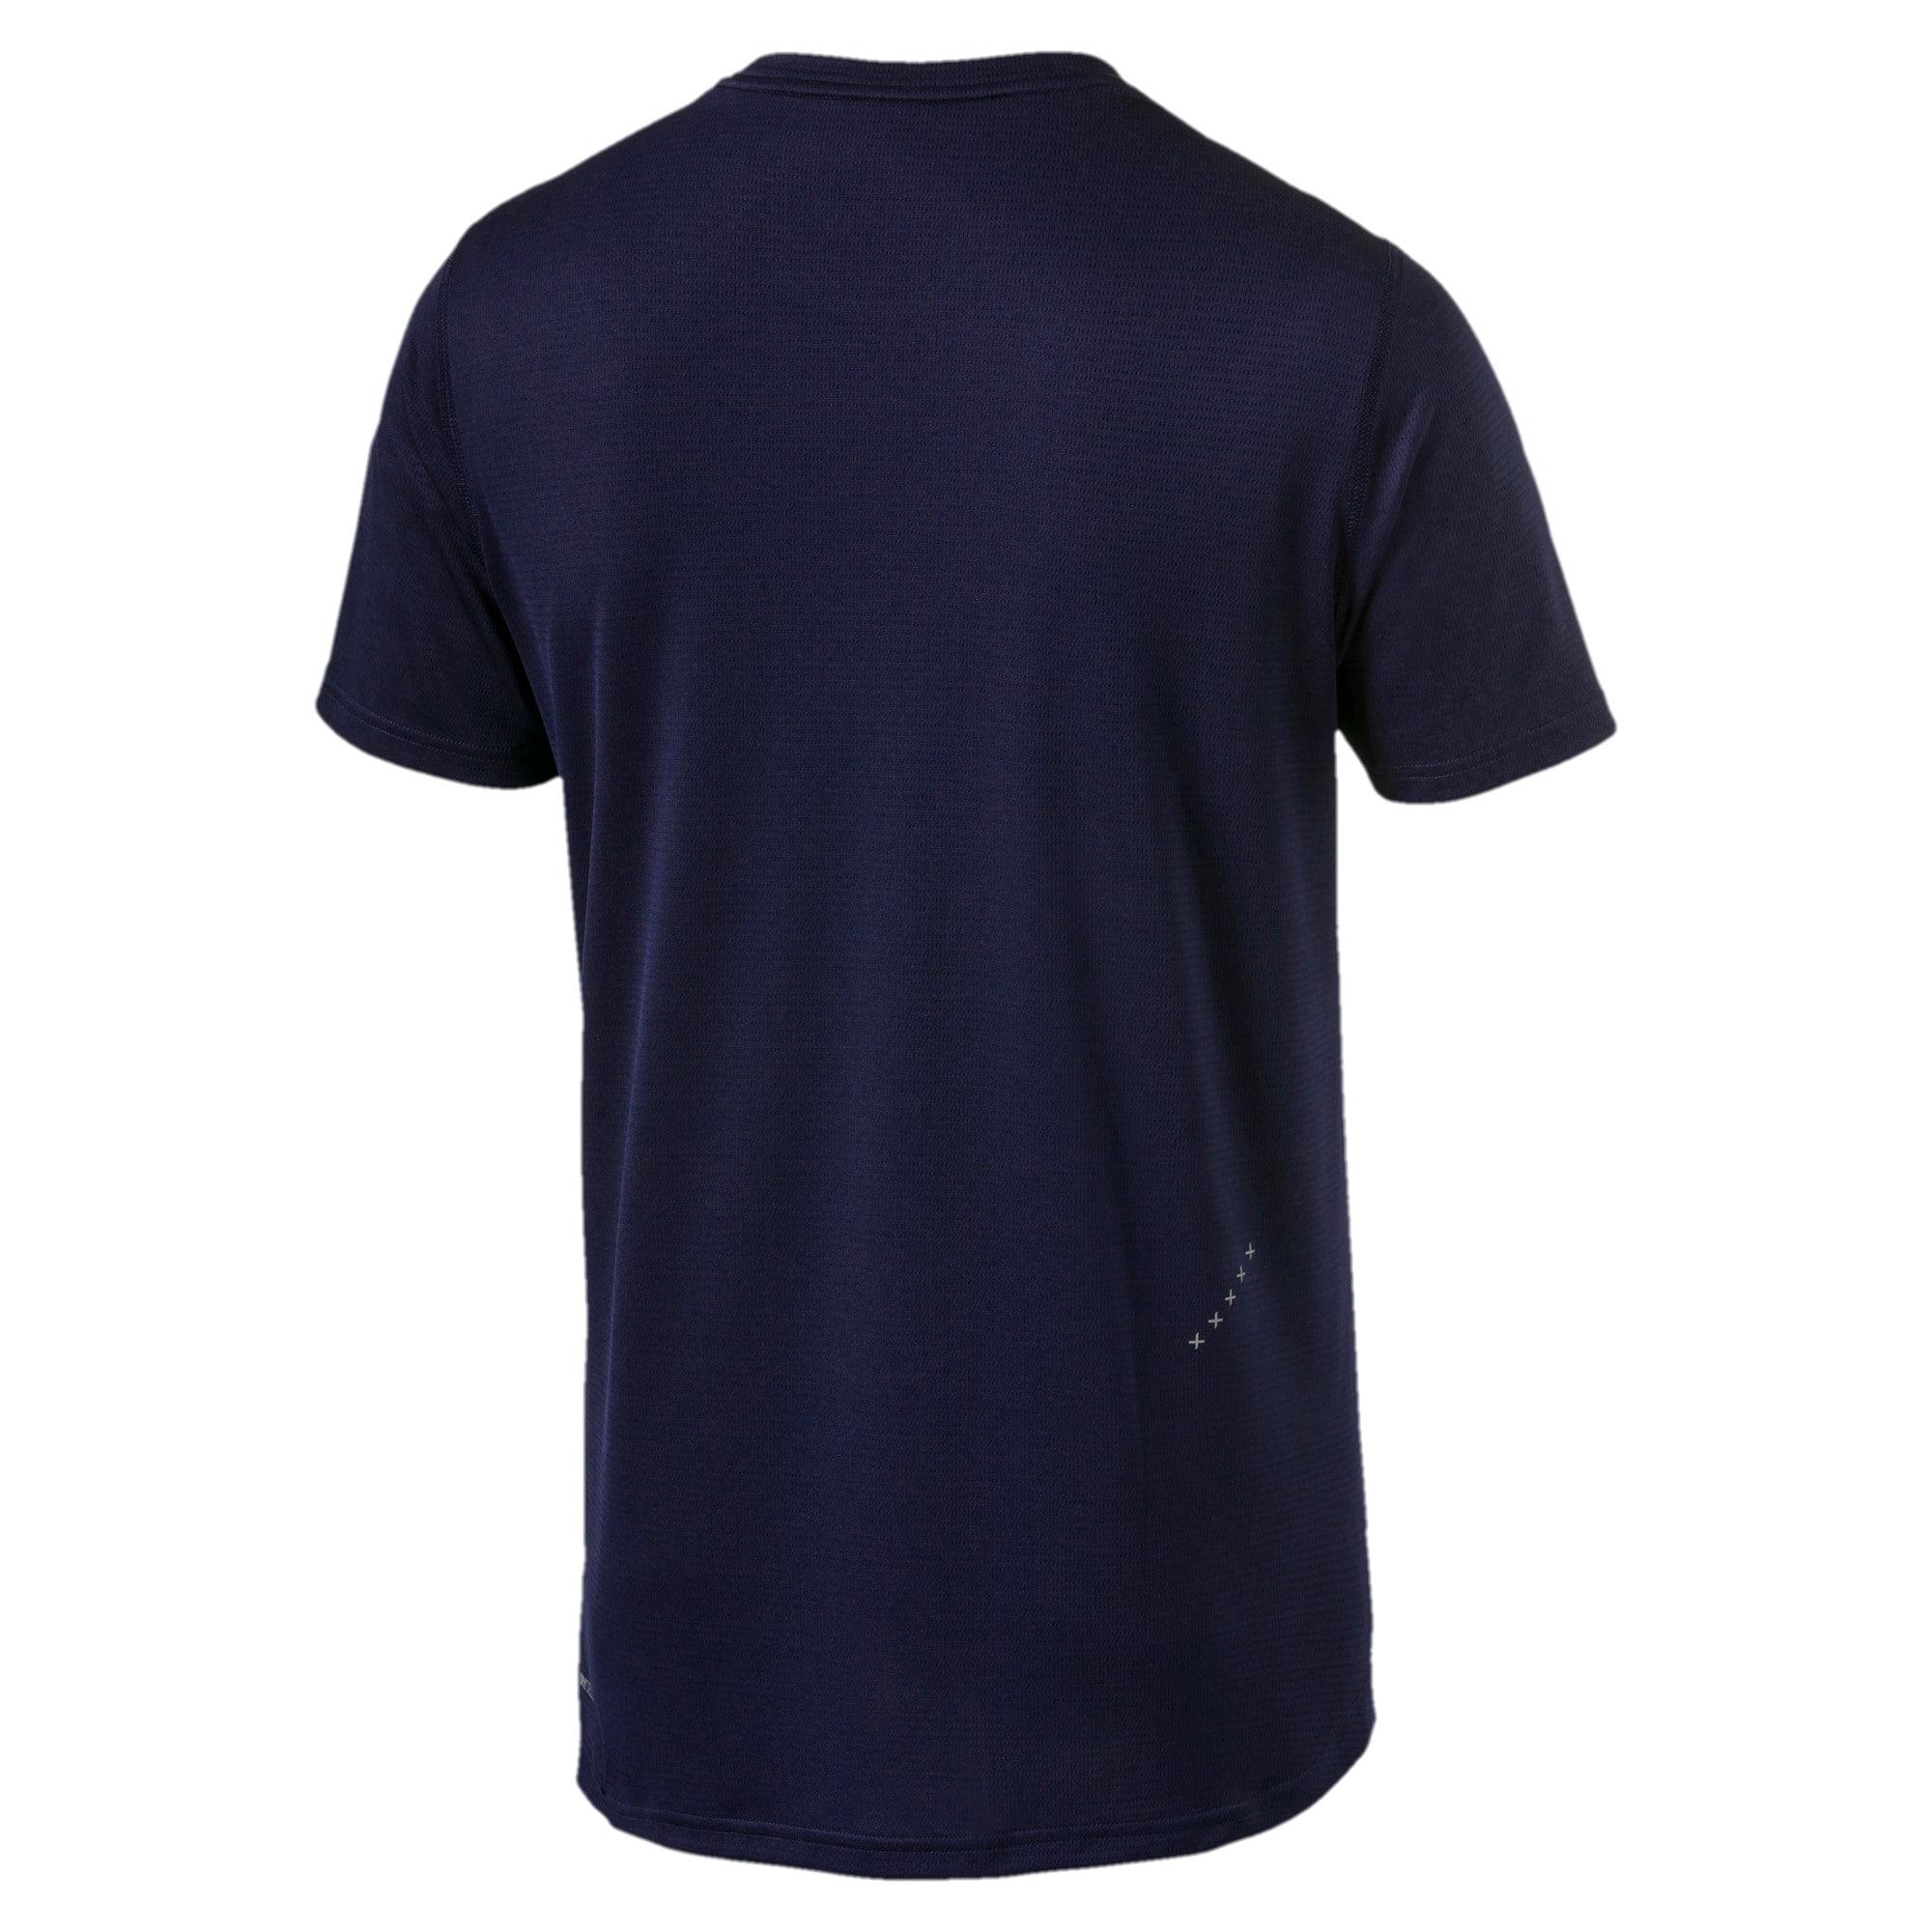 Thumbnail 5 of IGNITE Men's Running T-Shirt, Peacoat, medium